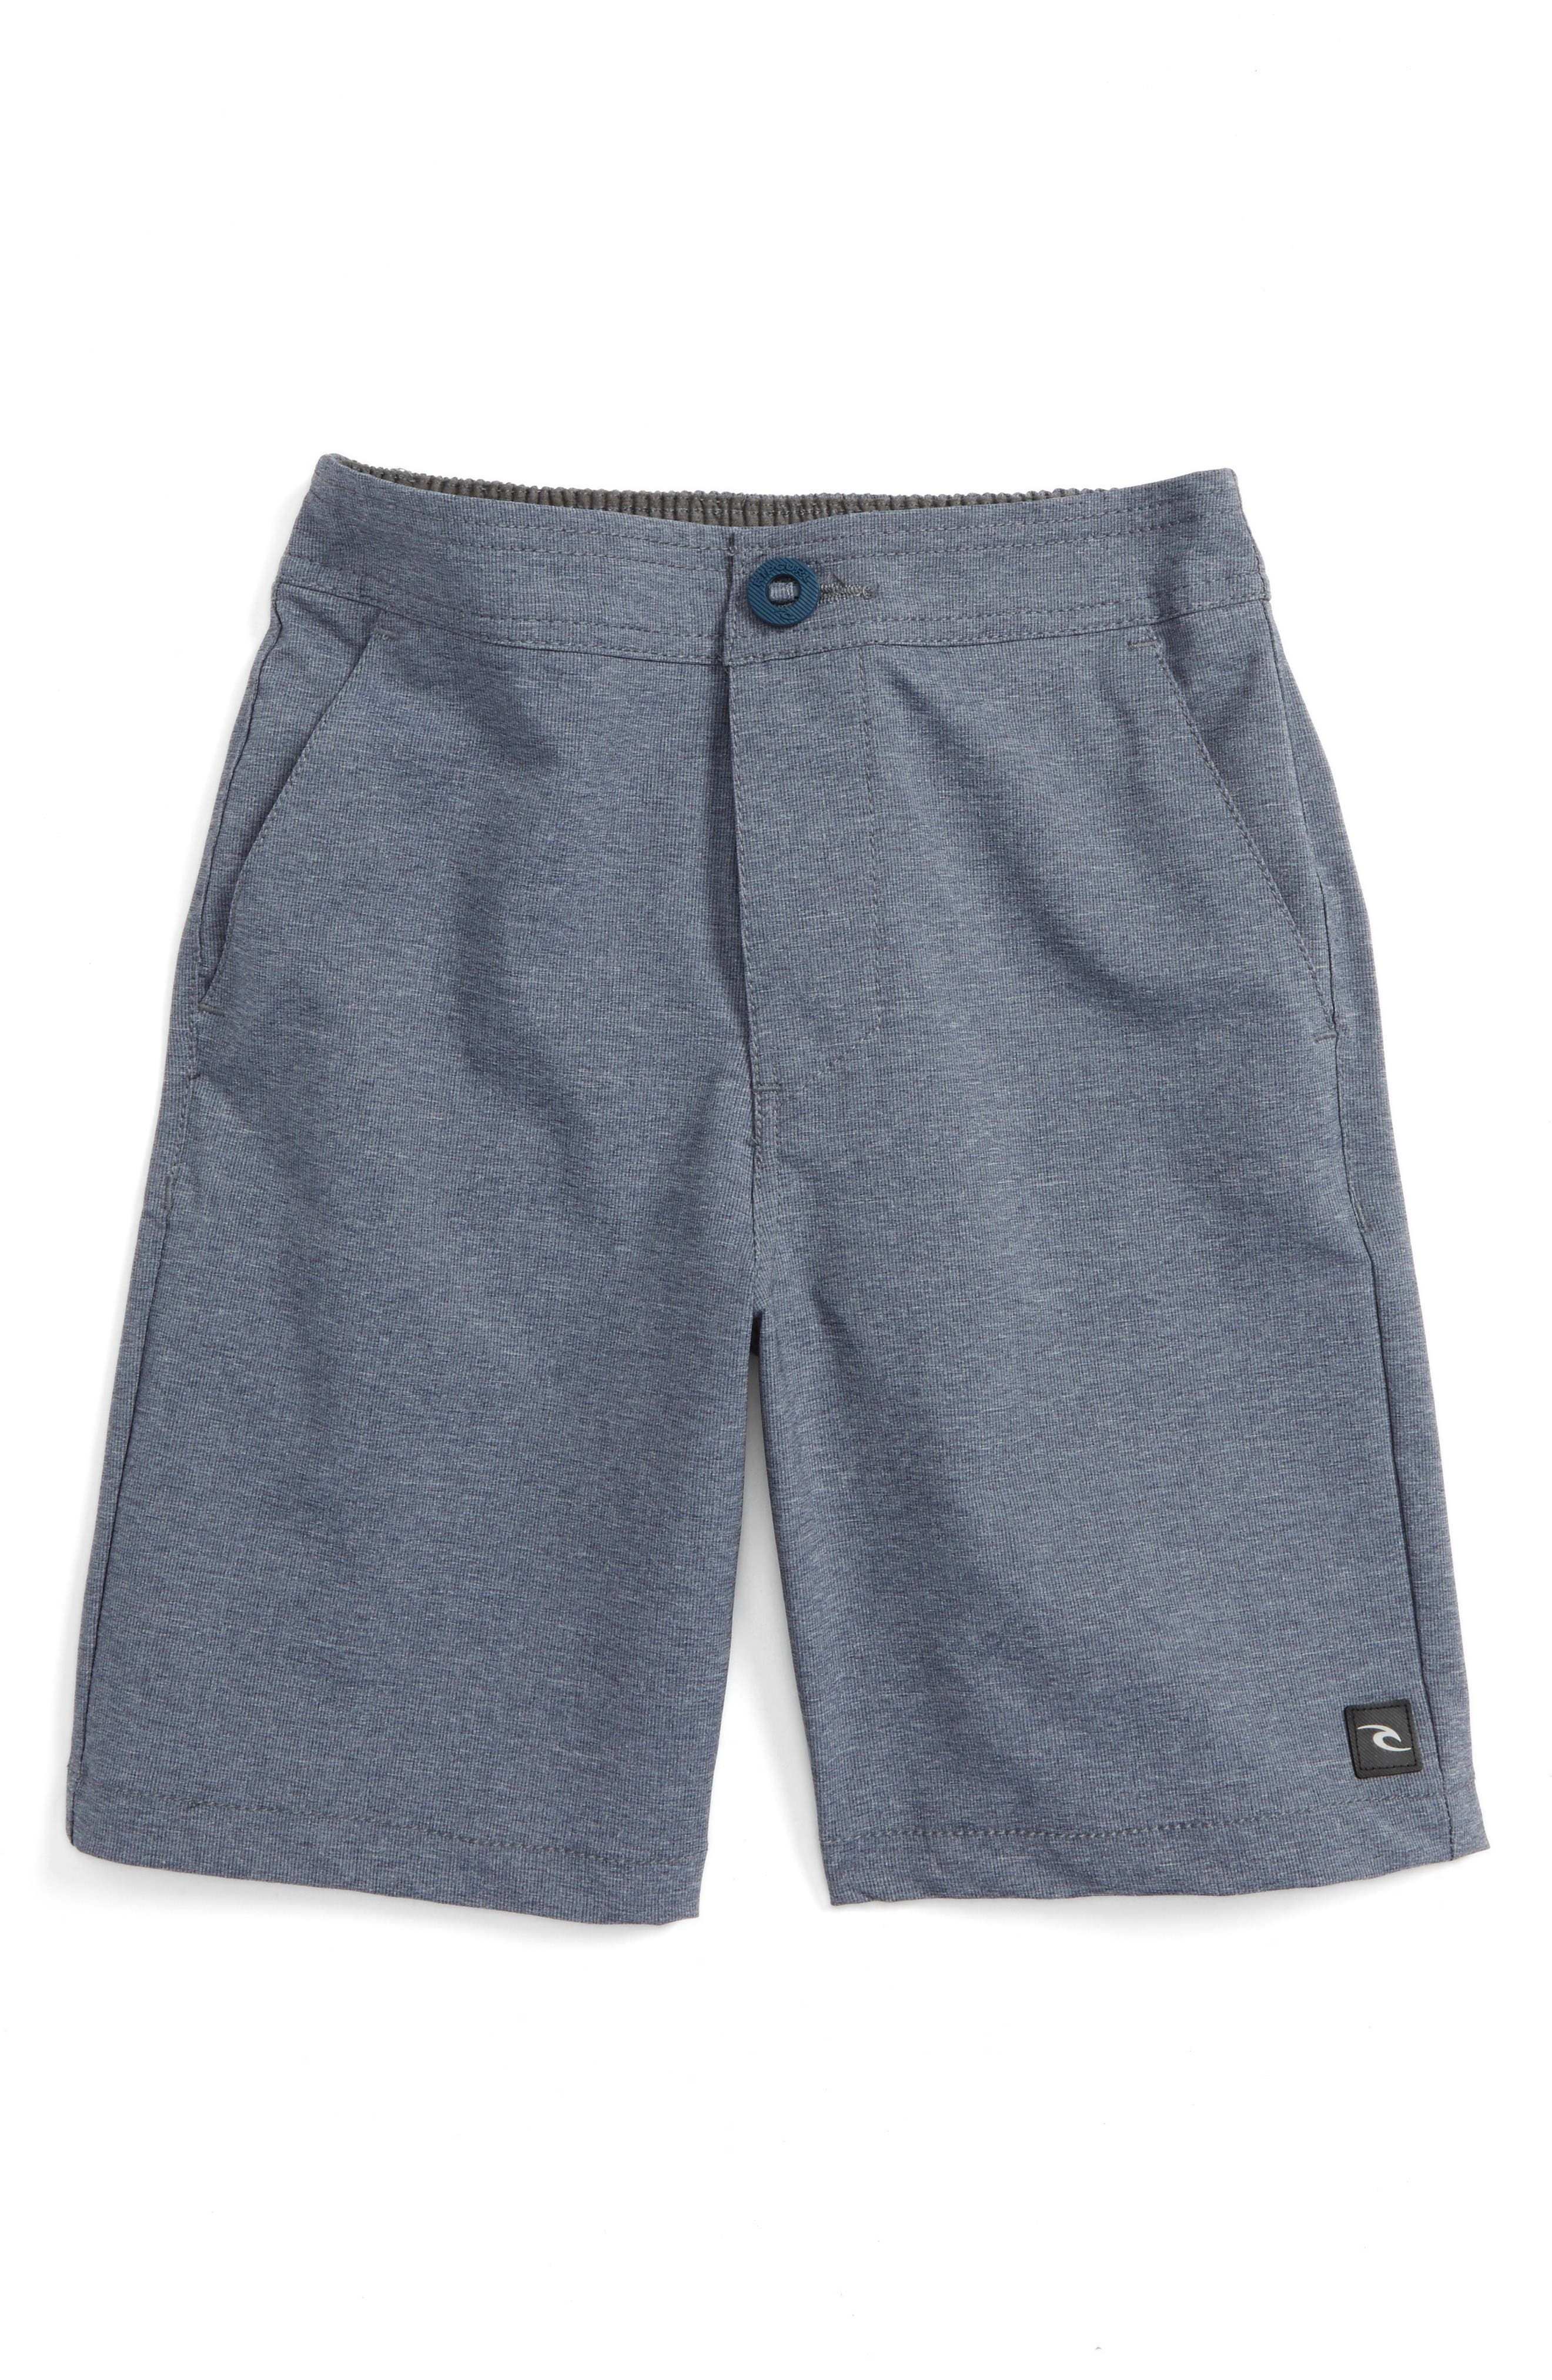 Main Image - Rip Curl Omaha Hybrid Board Shorts (Toddler Boys & Little Boys)